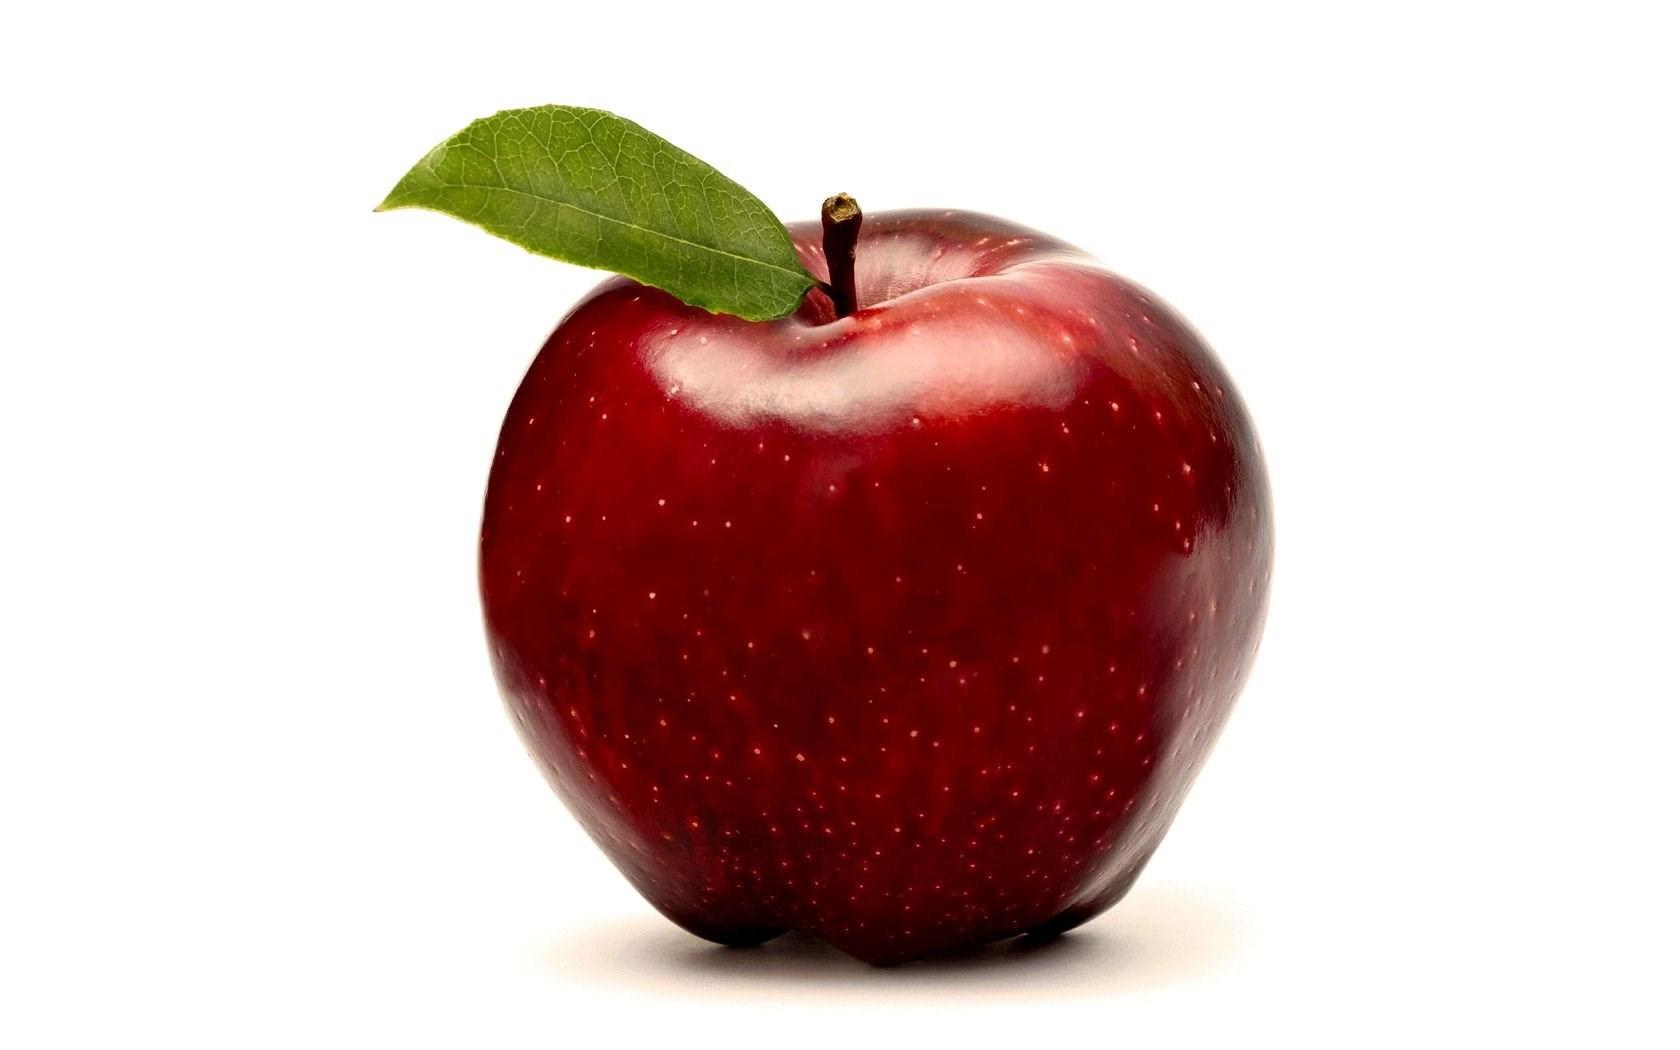 Red Apple Fruit Wallpapers White Backgrounds Desktop ...